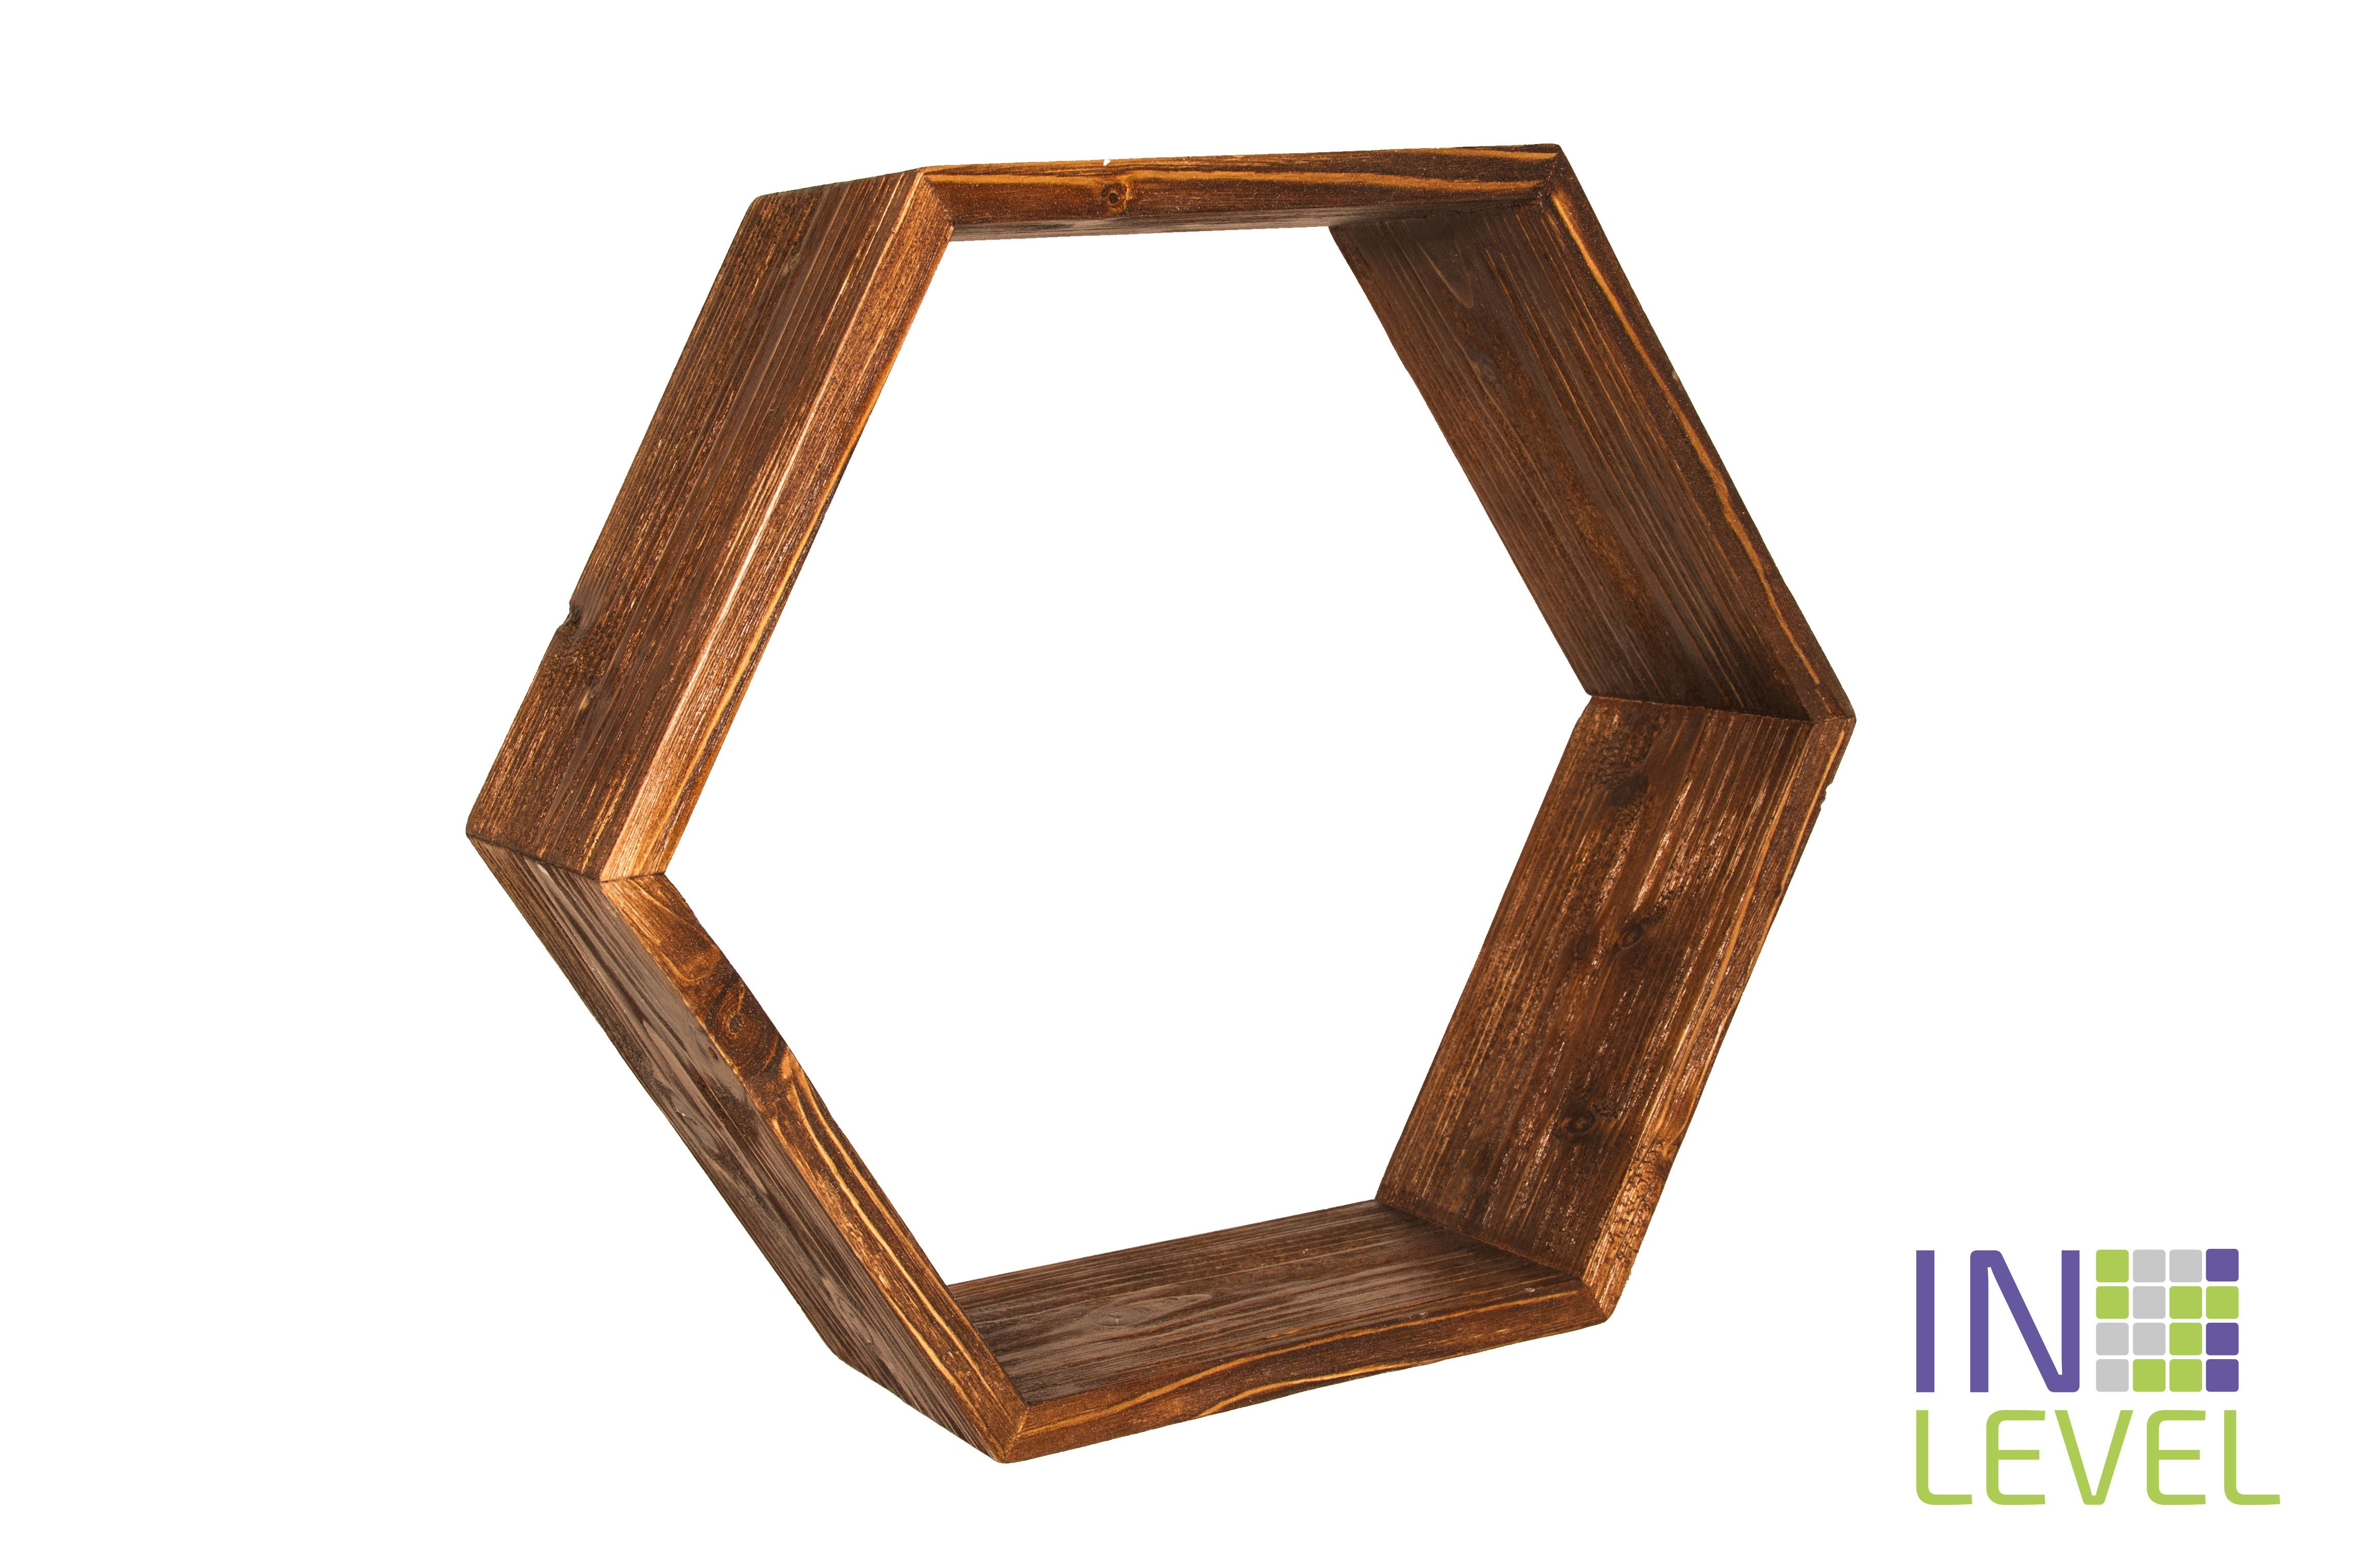 книги полка дерево декор мебель интерьер дизайн уют